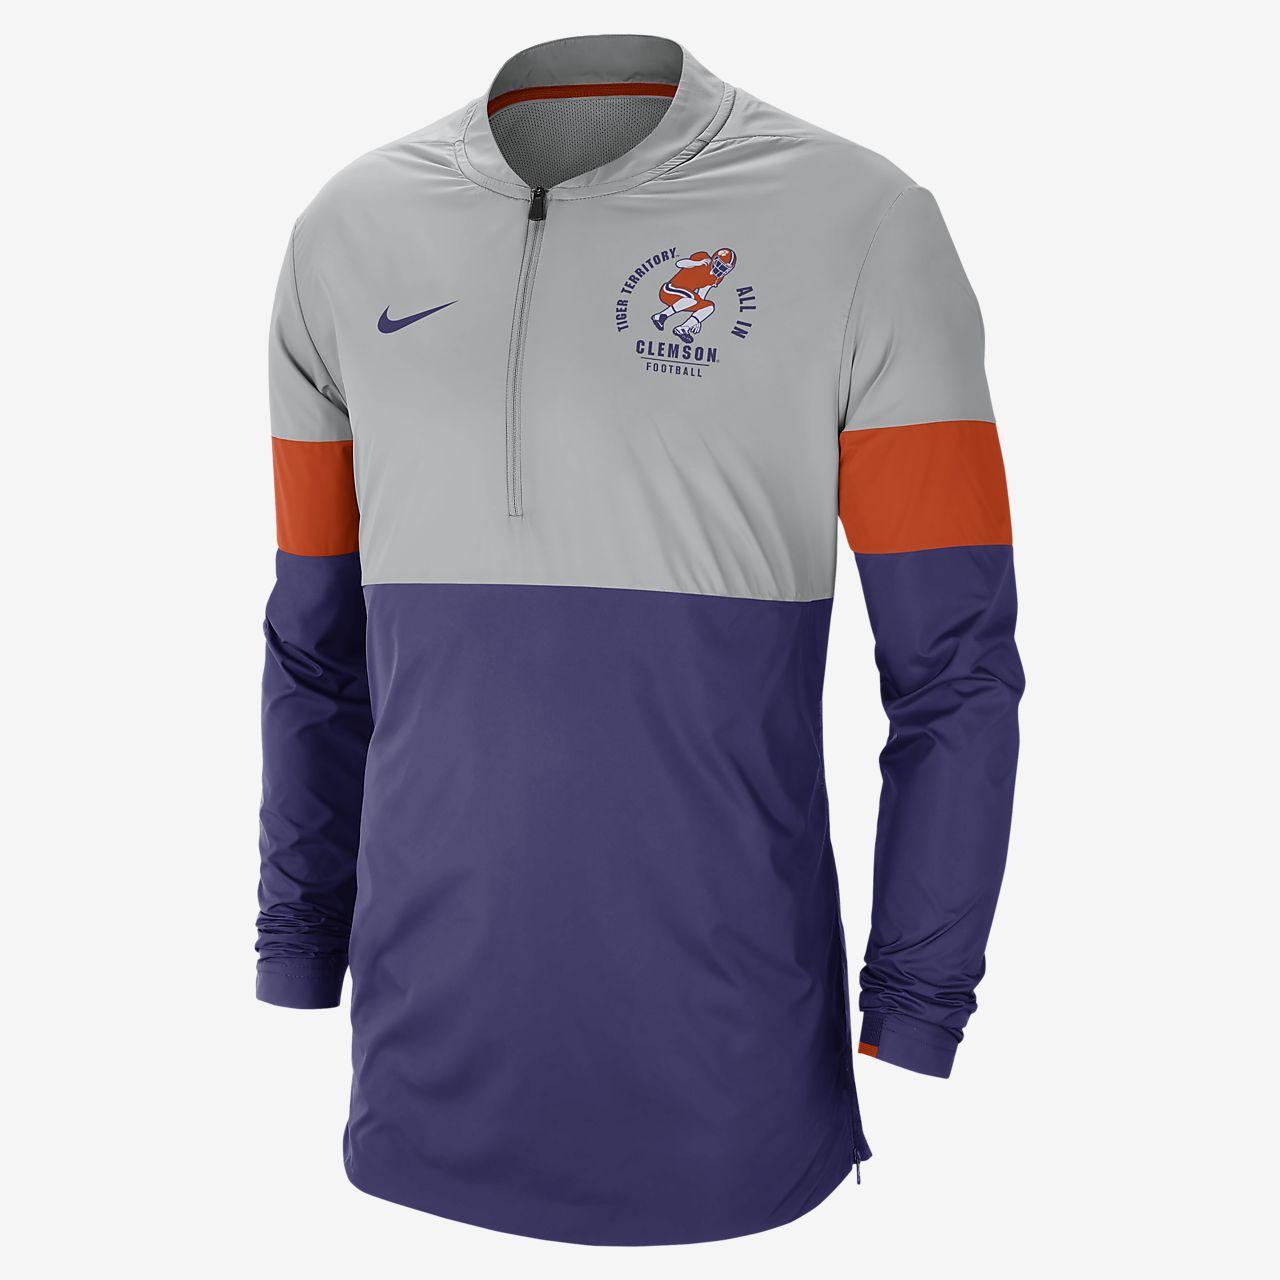 Nike College (Clemson) Men's Jacket